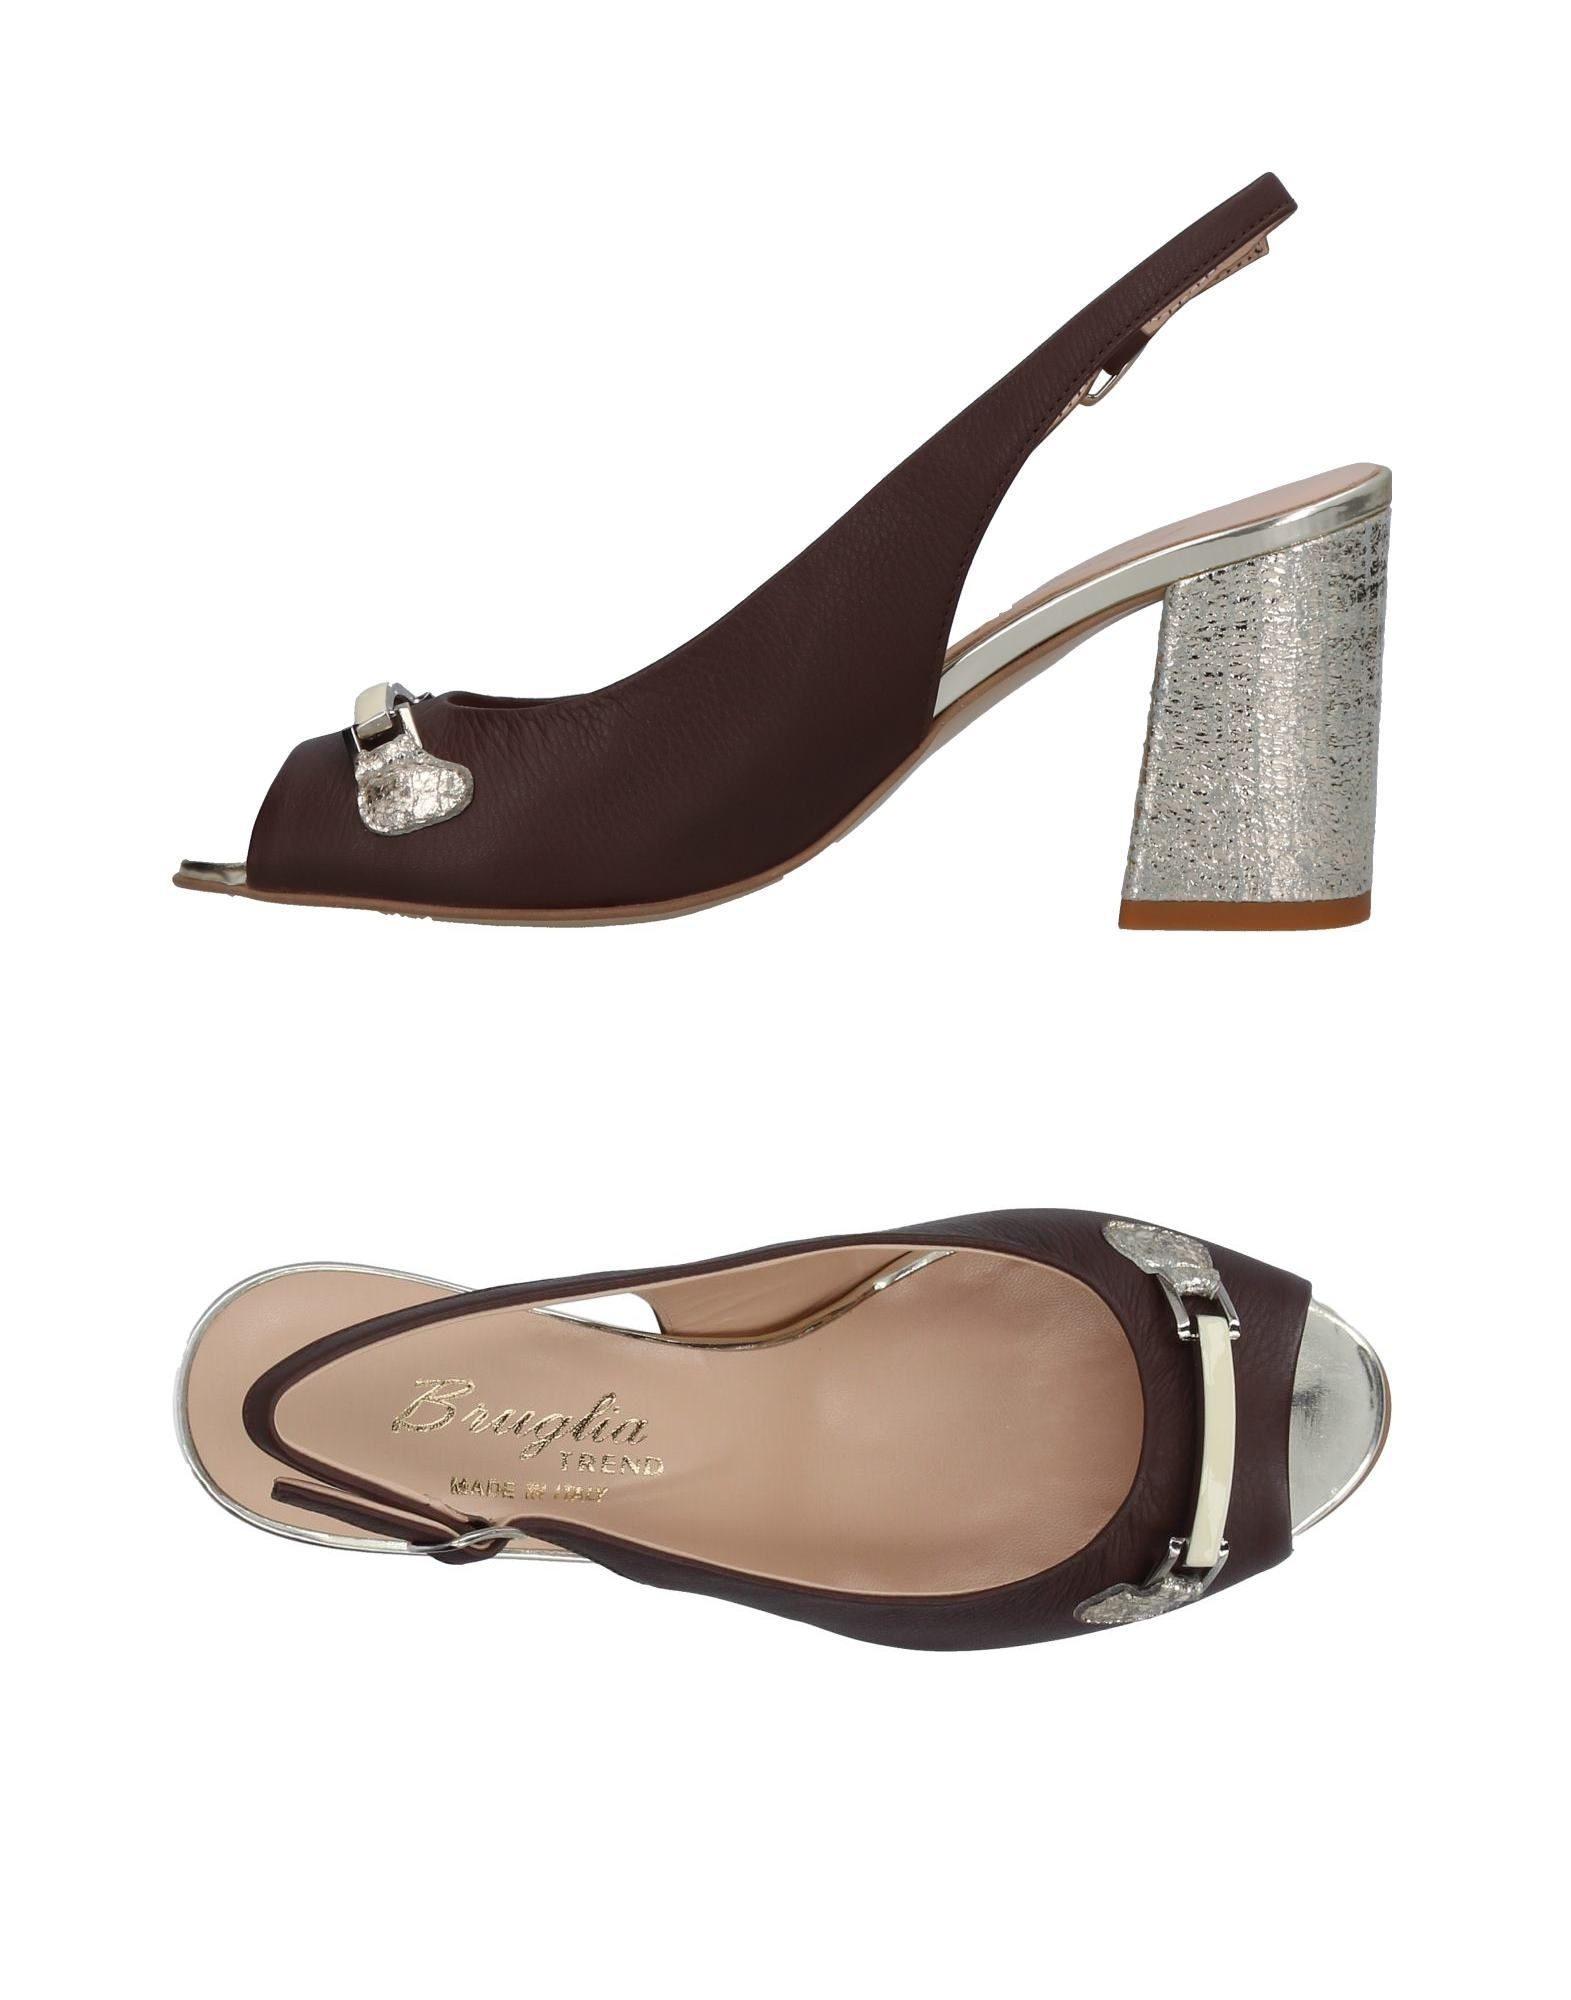 F.Lli Bruglia Sandalen Damen  11408793FS Gute Qualität beliebte Schuhe